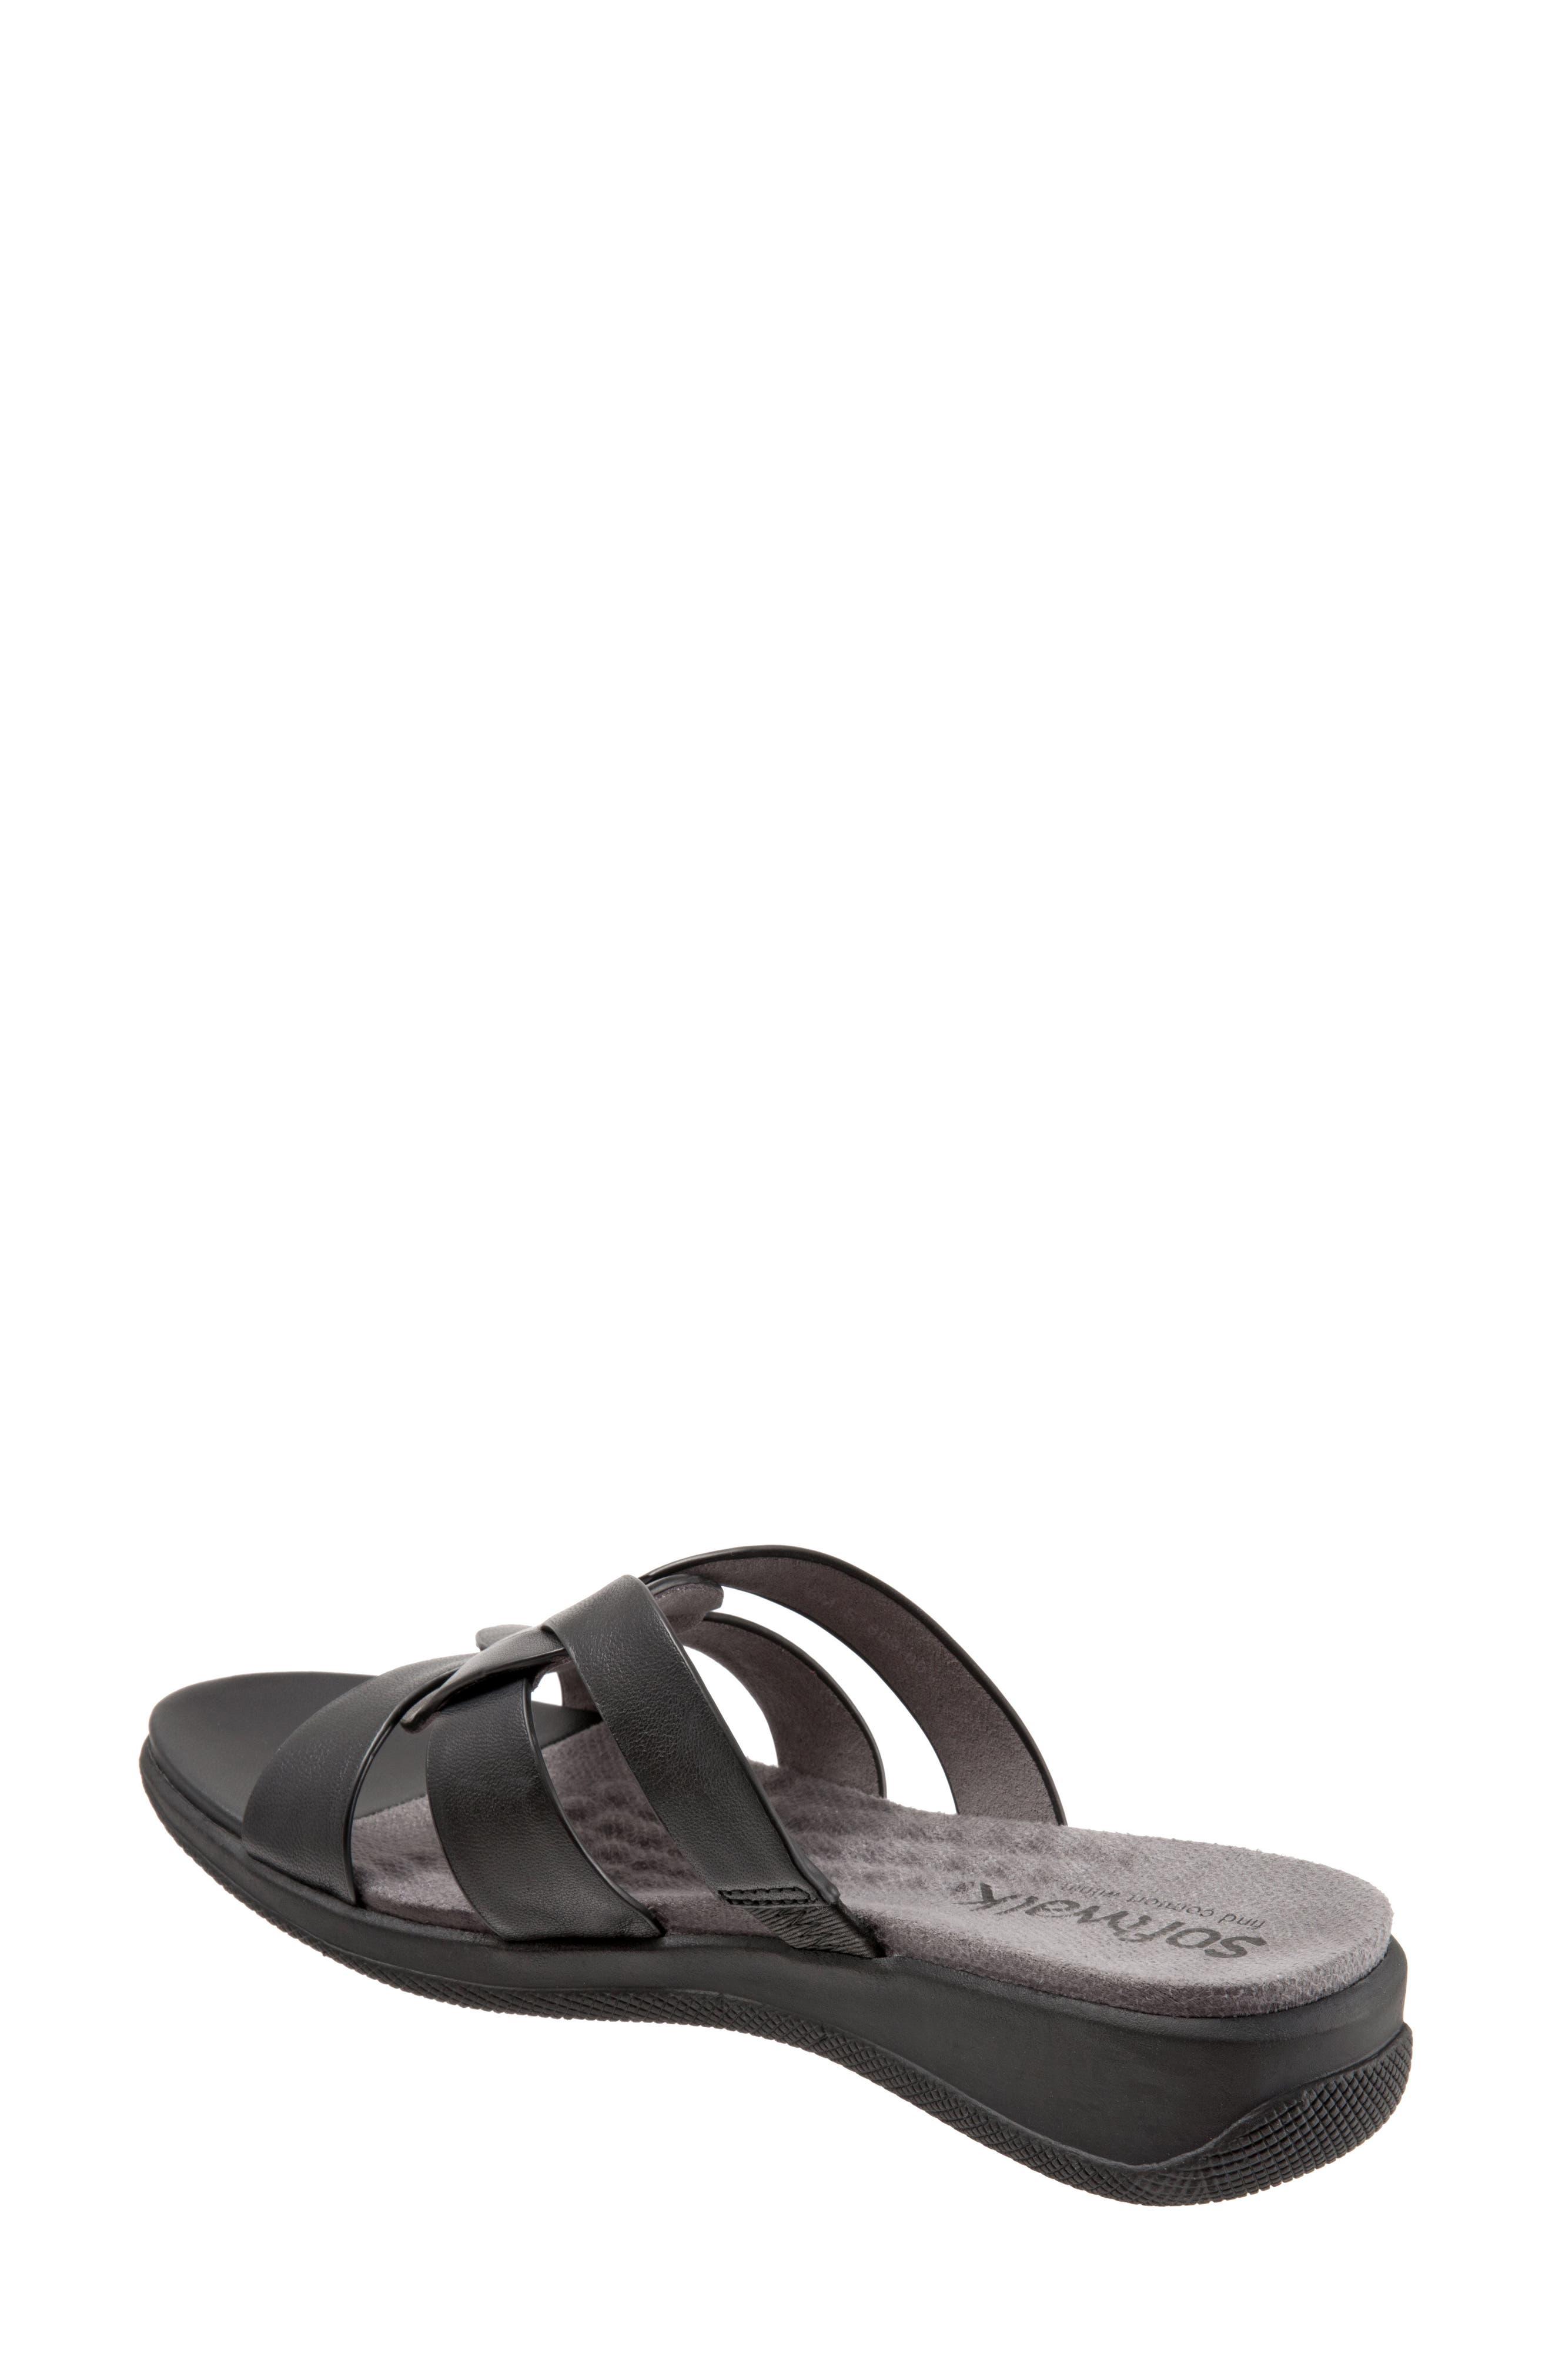 Thompson Slide Sandal,                             Alternate thumbnail 2, color,                             Black Leather